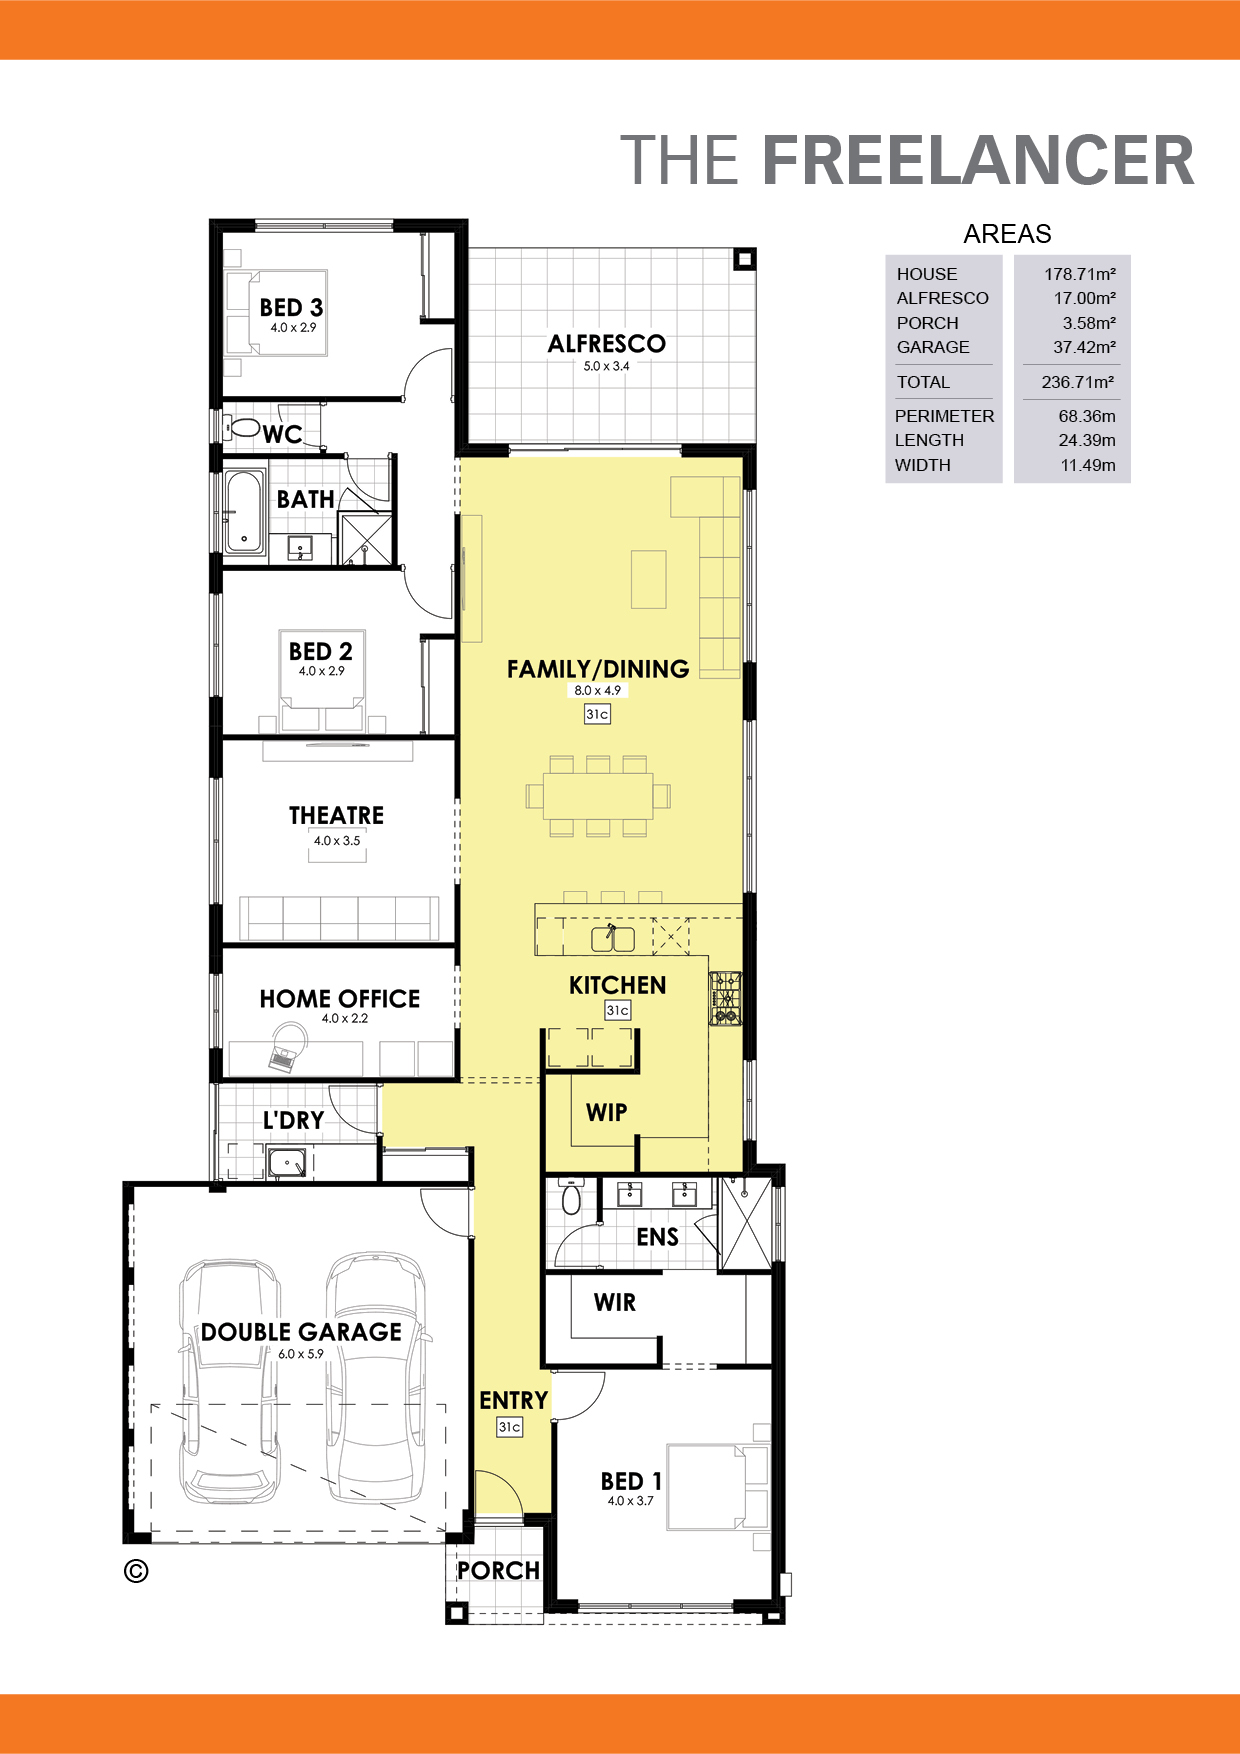 The Freelancer Floorplan